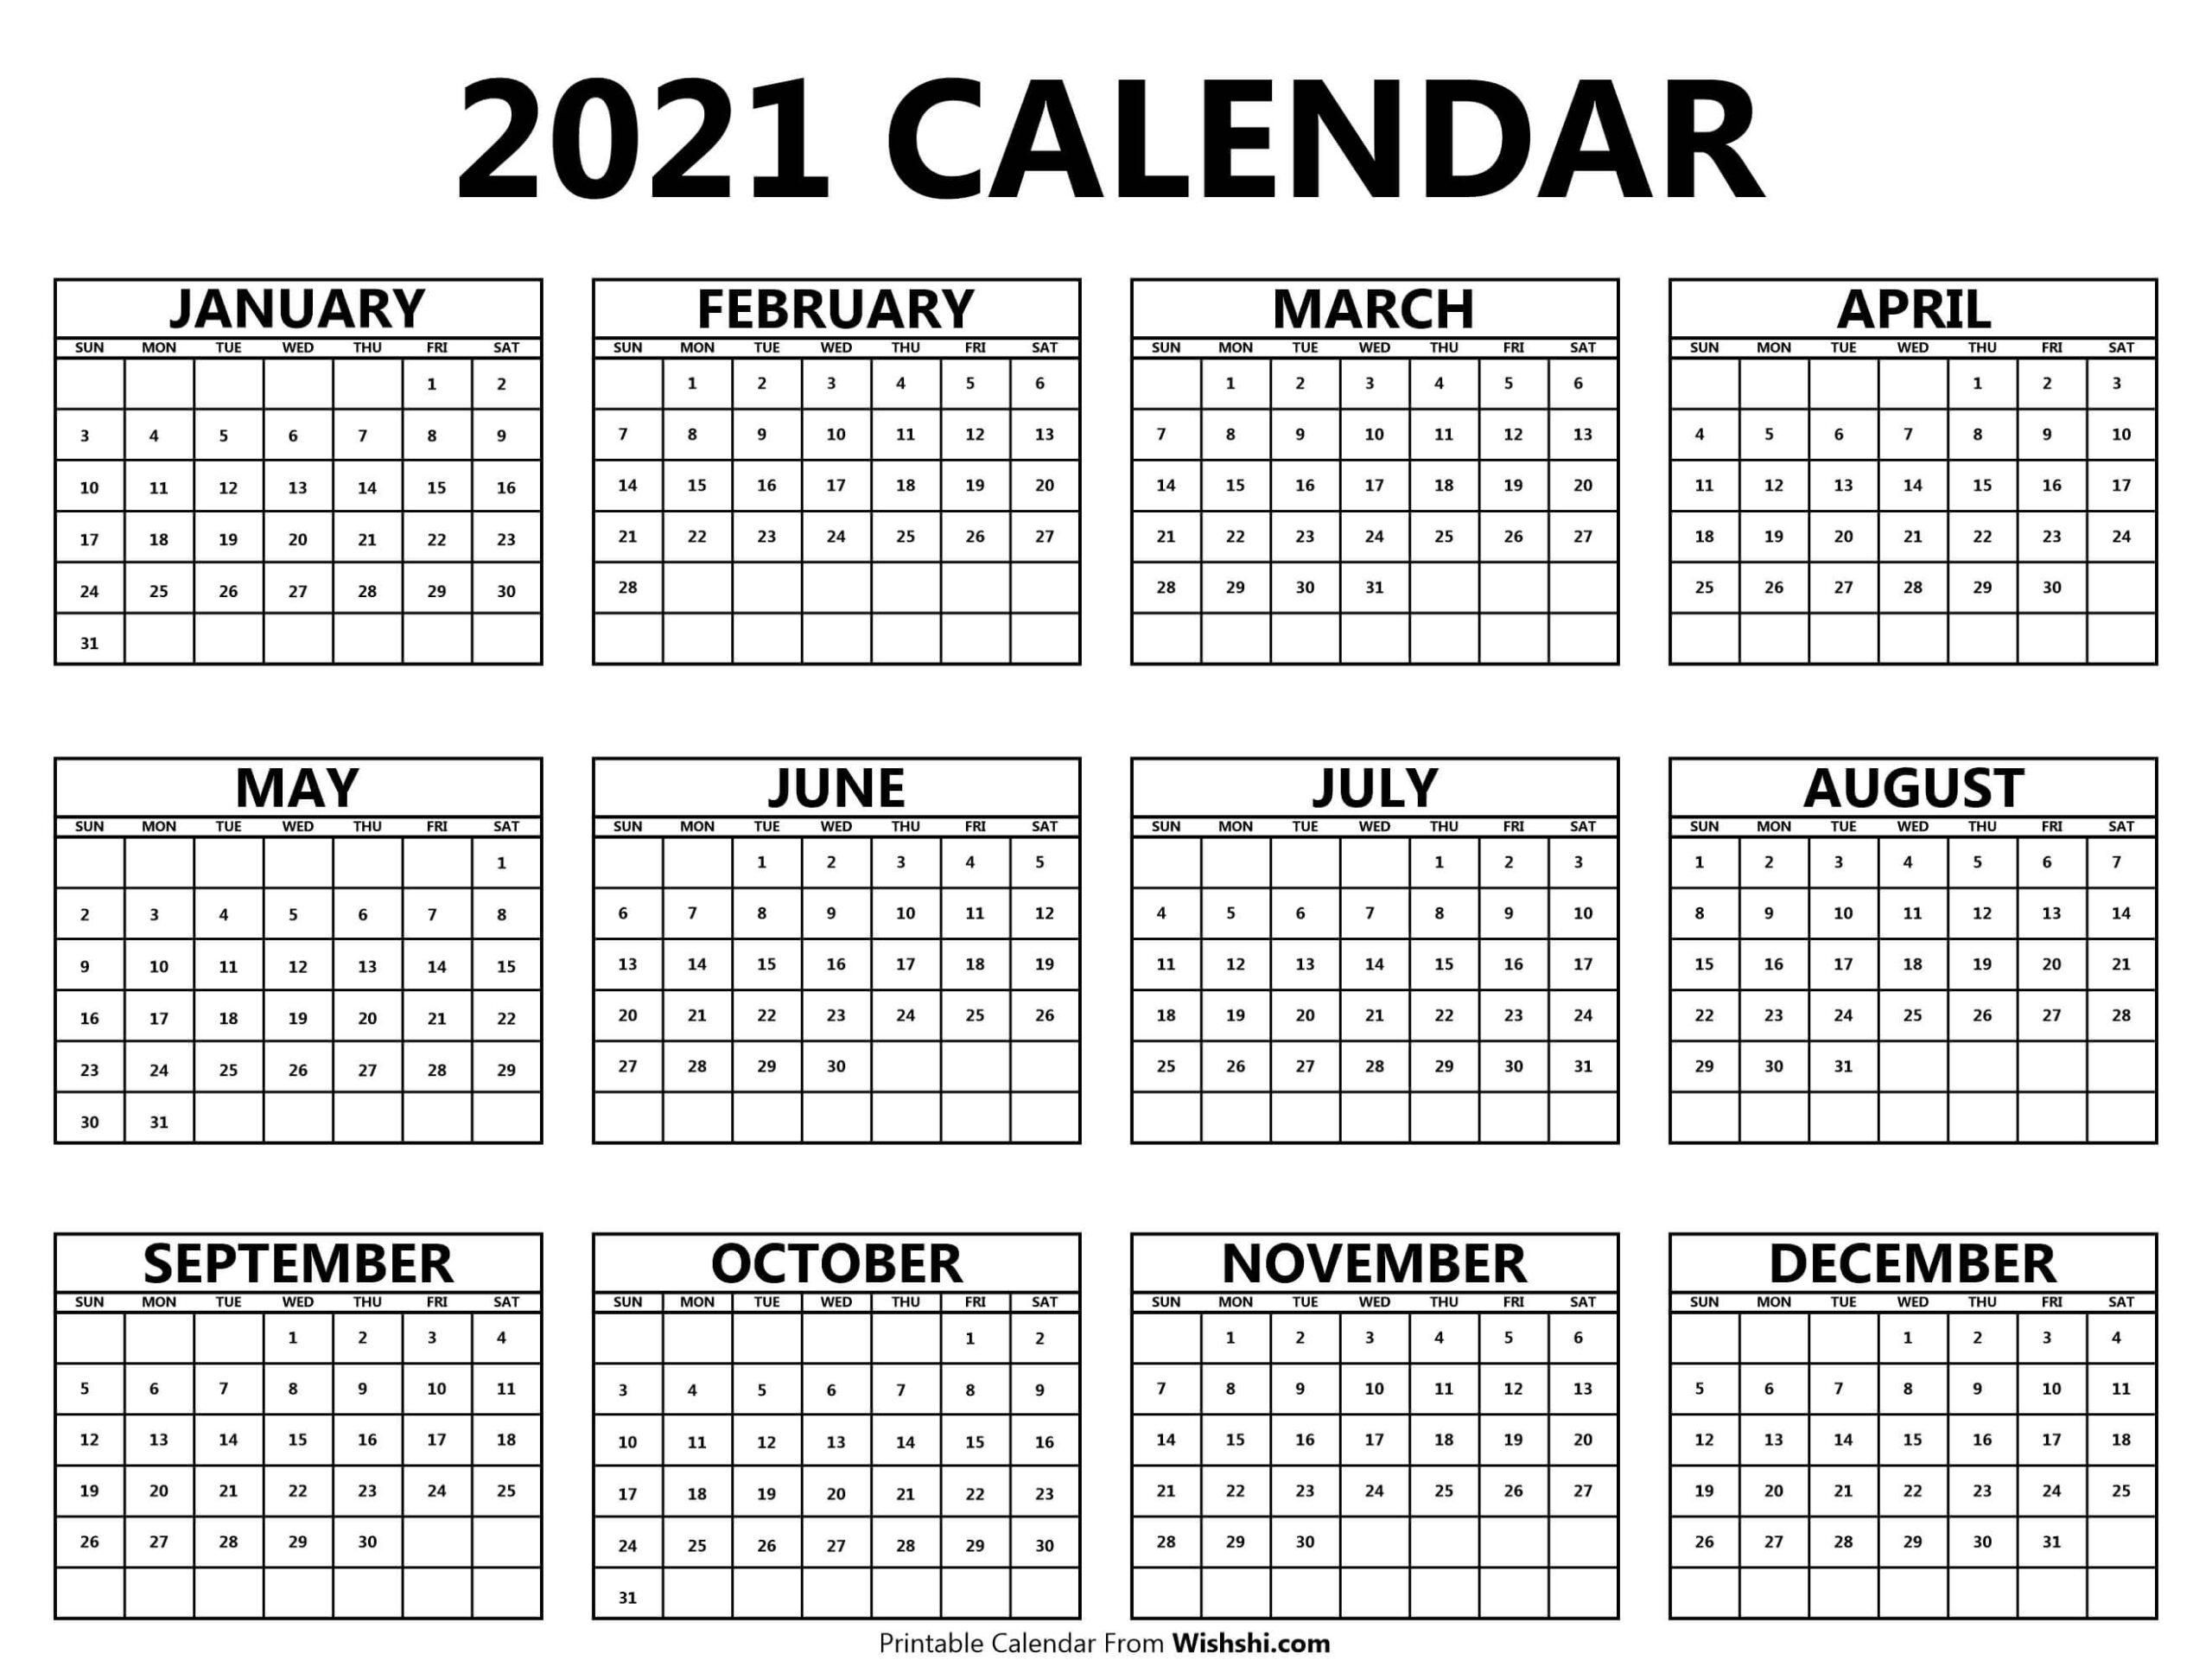 Printable 2021 Yearly Calendar - Free Printable Calendars  2021 Yearly Calendar Printable Free